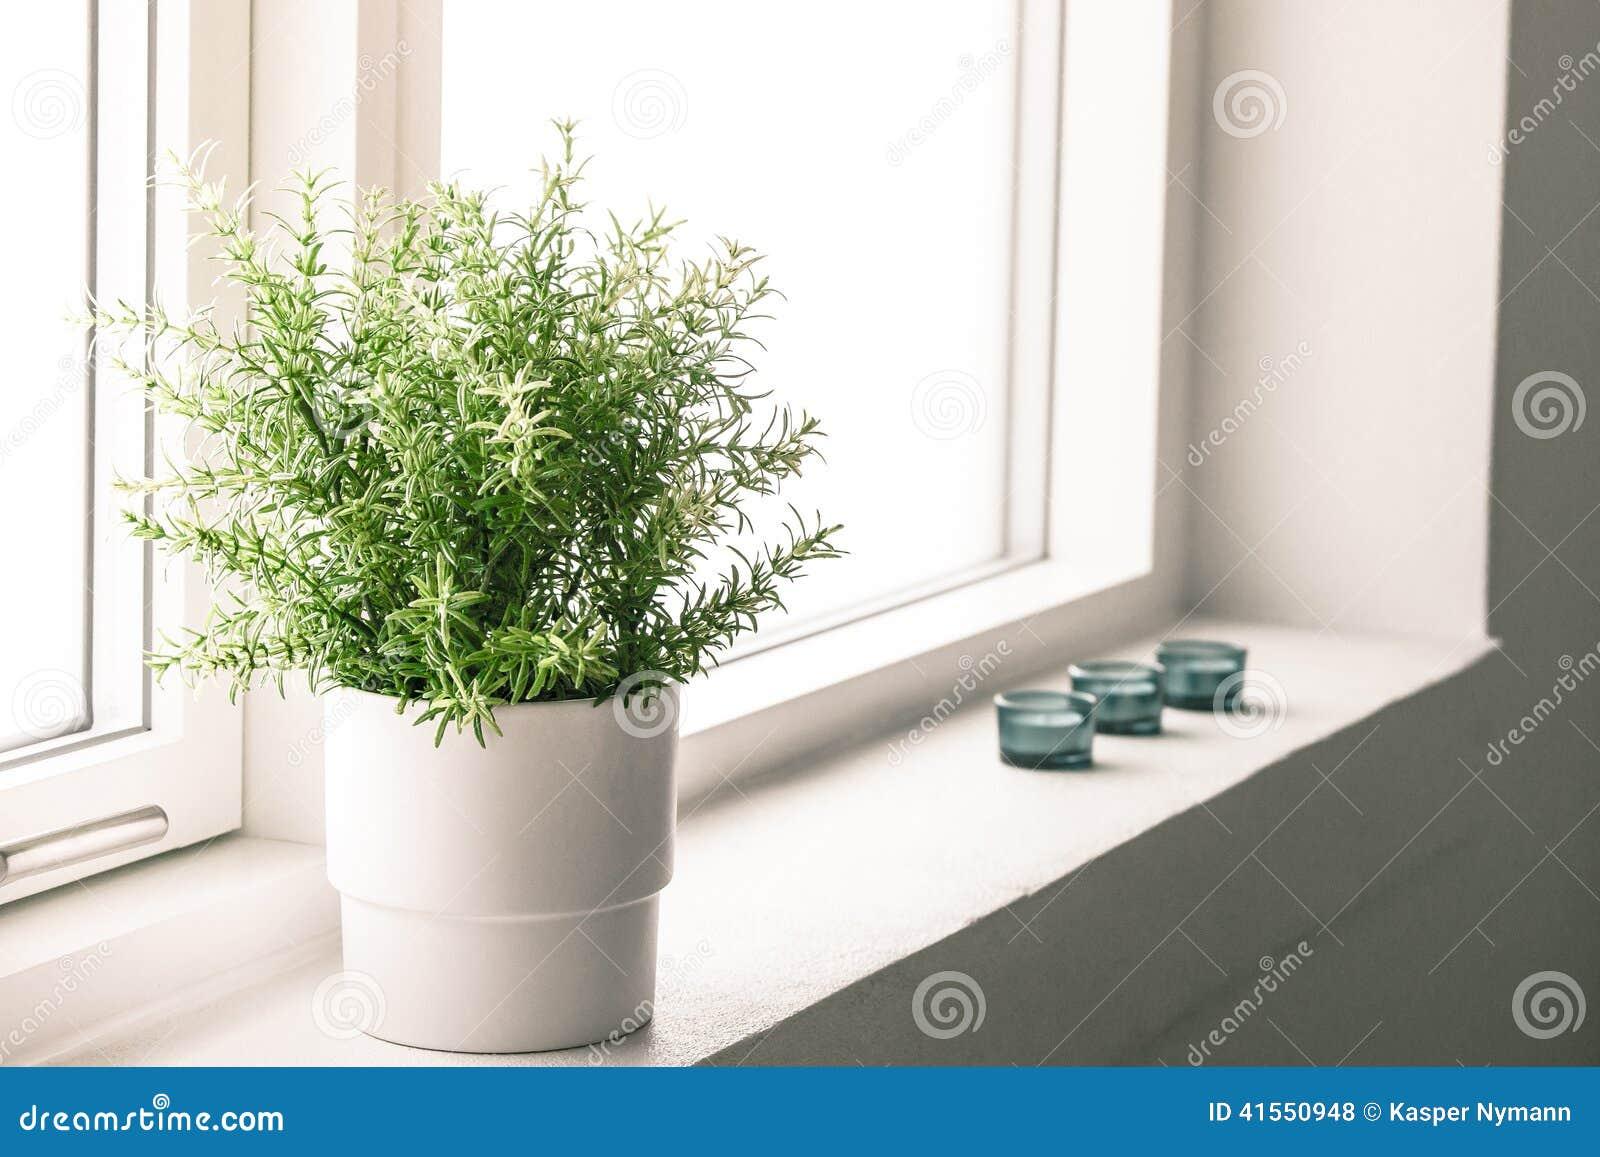 Indoor Plant In A Bathroom Window Stock Photo Image